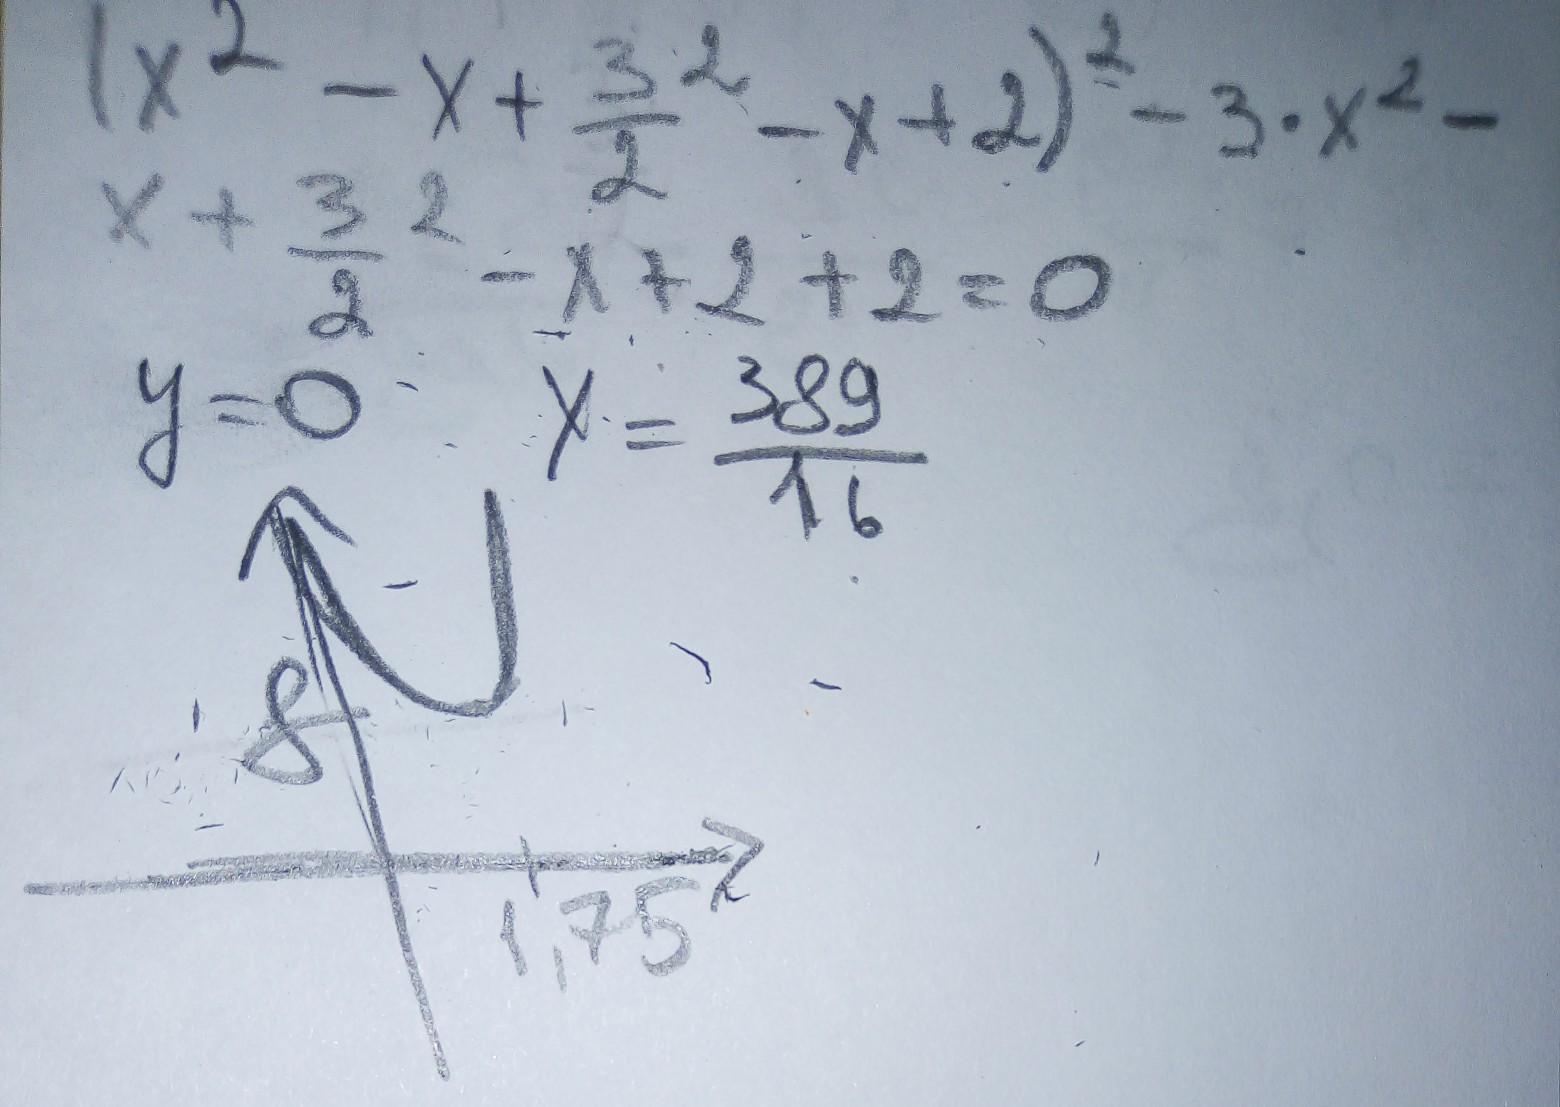 (x^2-x+3/2x^2-x+2)^2 -3•x^2-x+3/2x^2-x+2 +2=0